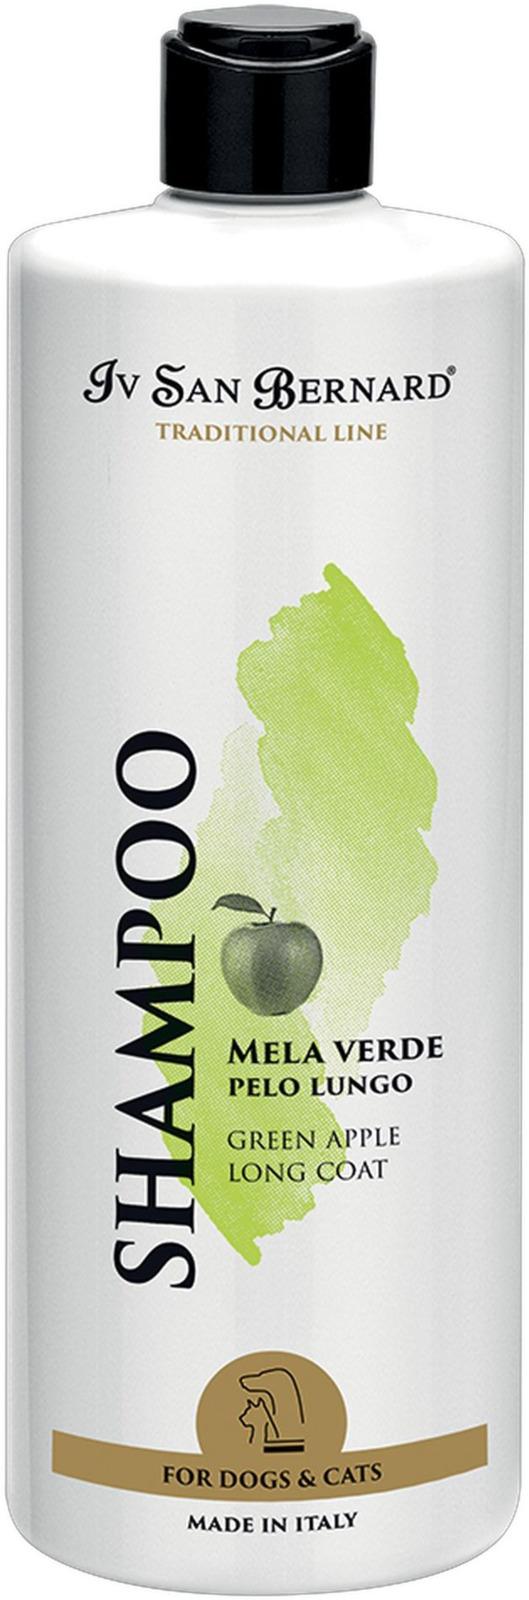 Шампунь для животных Iv San Bernard ISB Traditional Line Green Apple, для длинной шерсти, 500 мл line шампунь